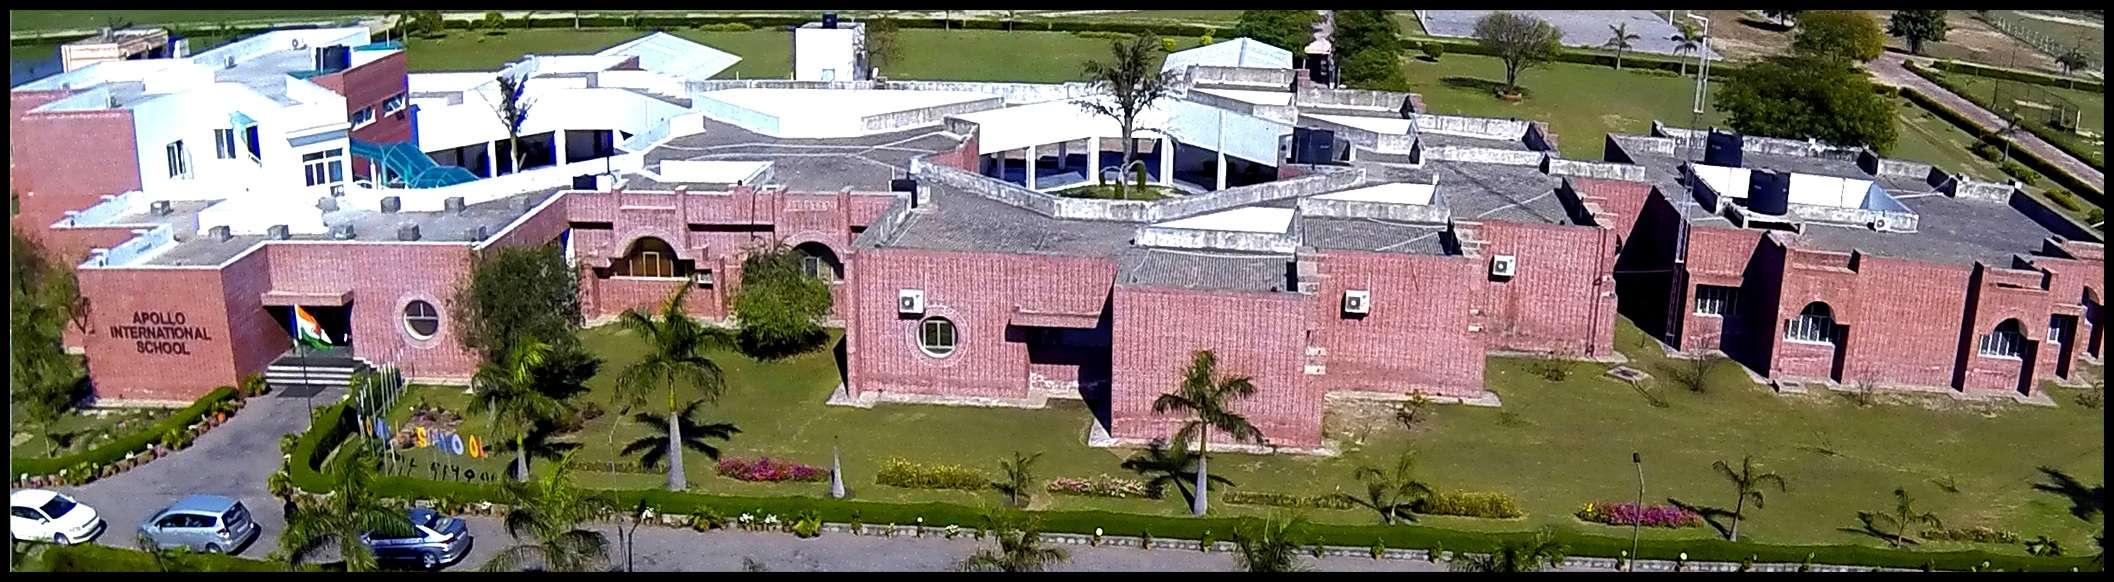 APOLLO INTERNATIONAL SCHOOL BARI G T KARNAL ROAD DISTT SONEPAT HARYANA 530528